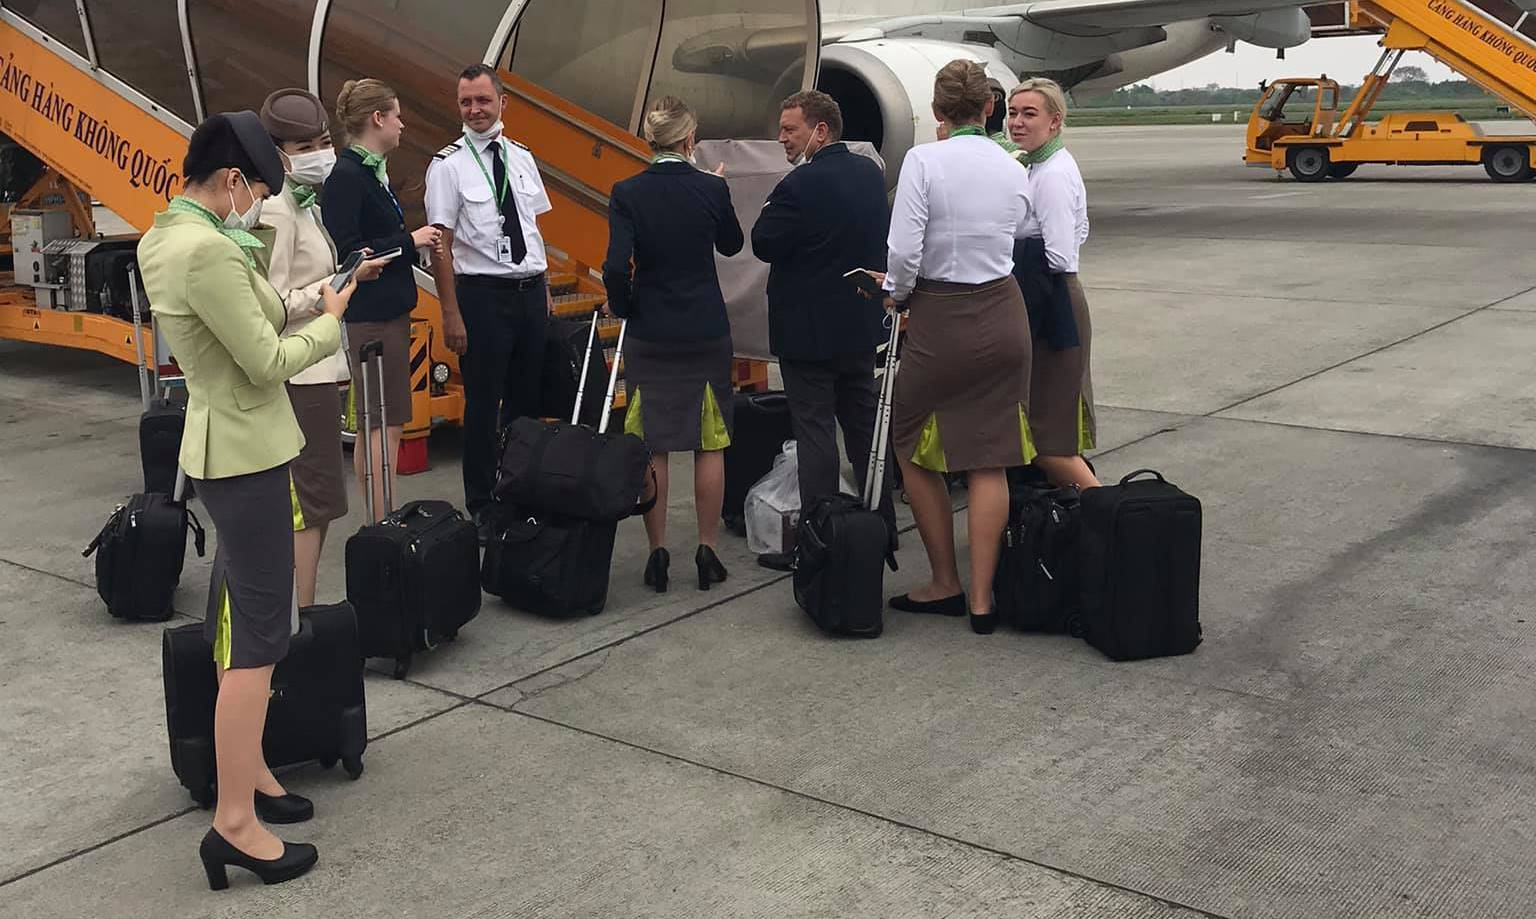 Great Dane Airlines-crew i Vietnam. (Foto: Peter Christian Bühlmann Jensen)